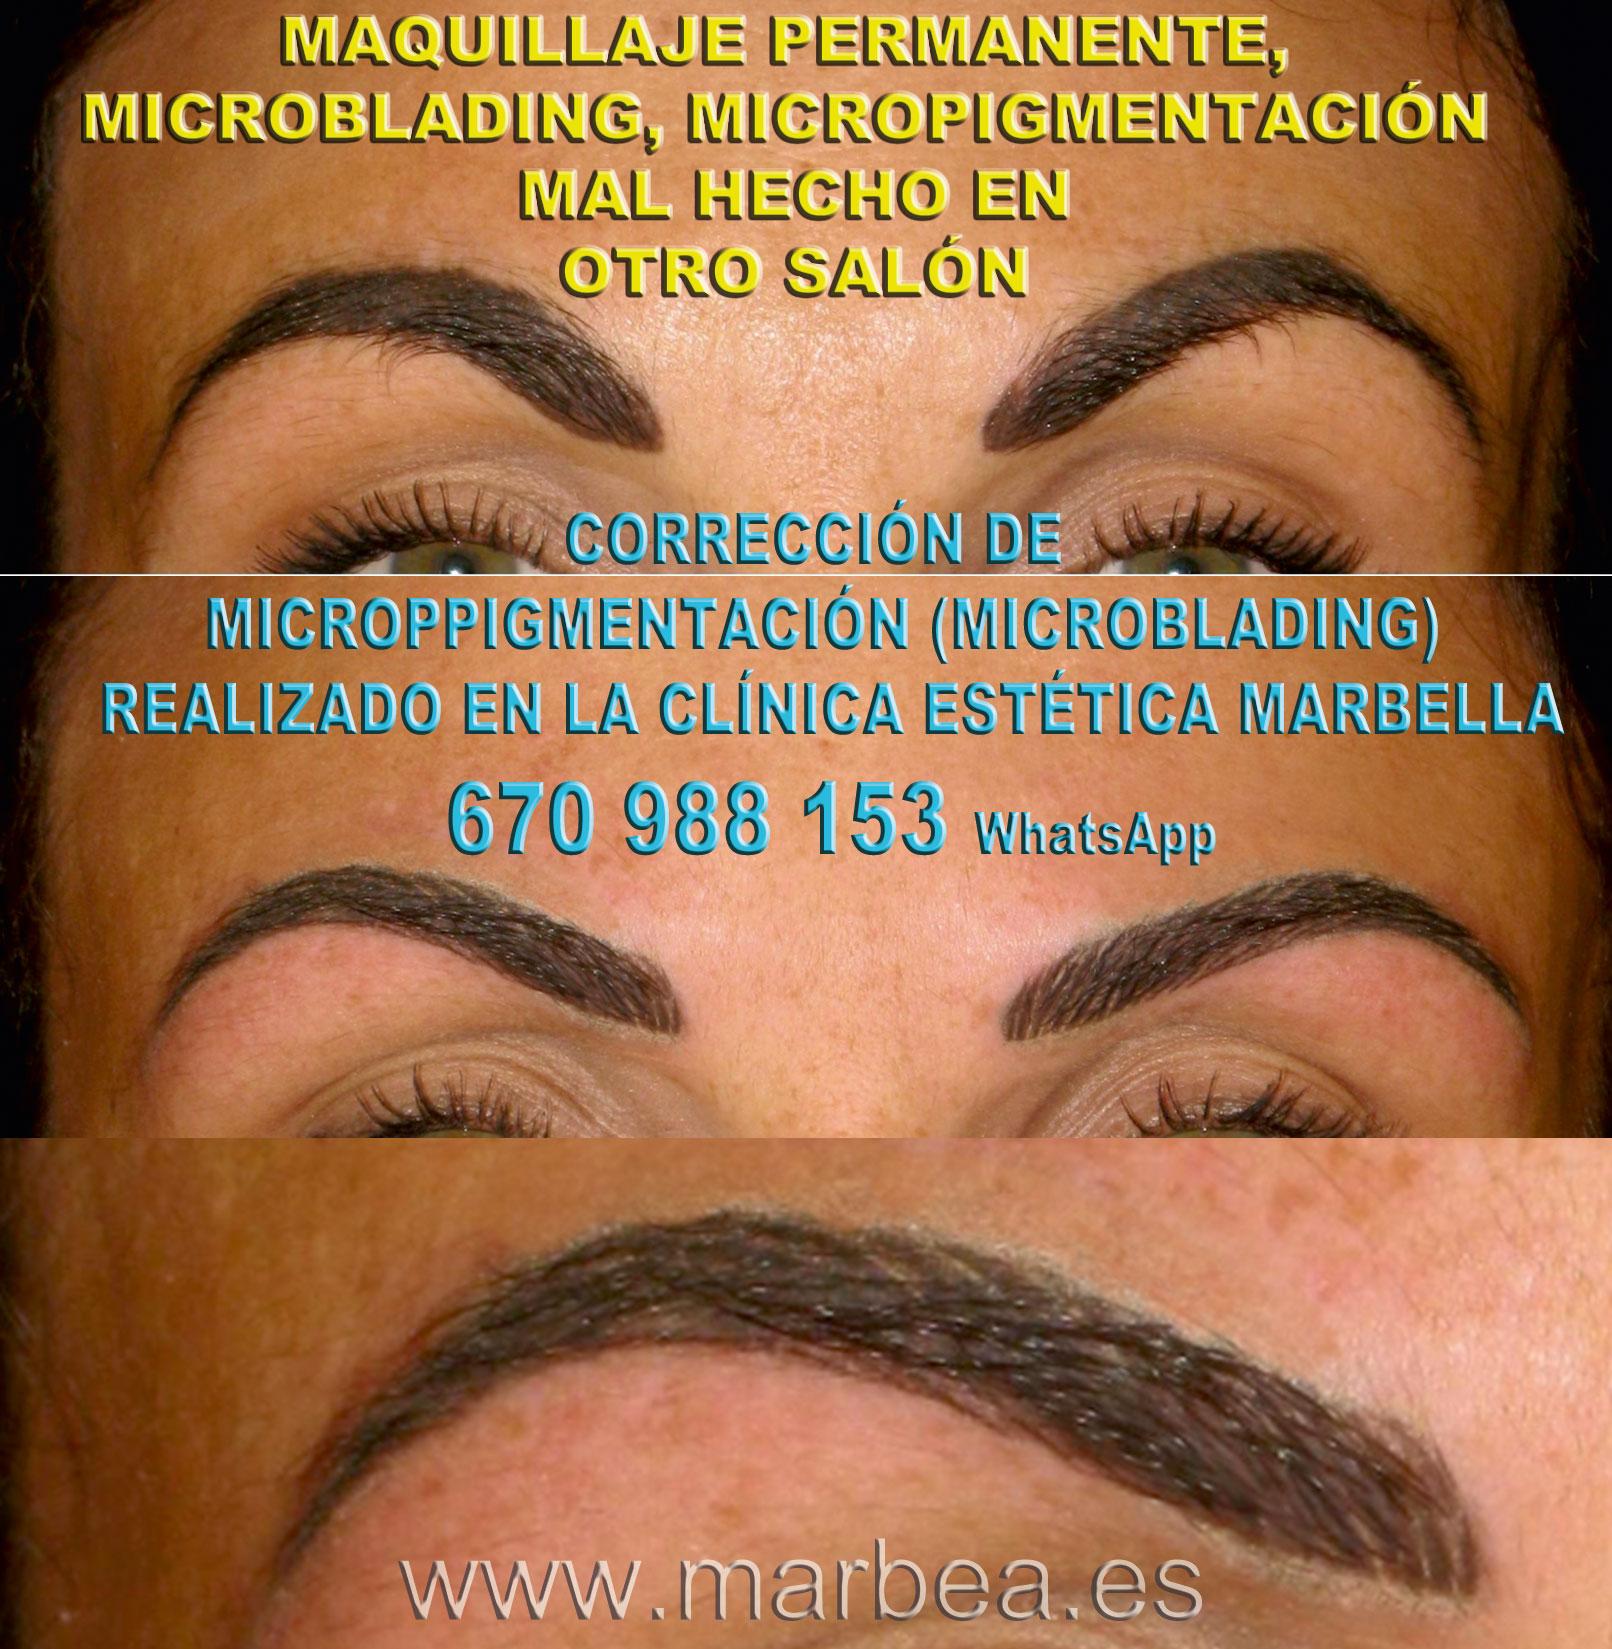 ELIMINAR TATUAJE CEJAS clínica estética micropigmentación entrega corrección de micropigmentación en cejas,reparamos microppigmentacion mal hechos